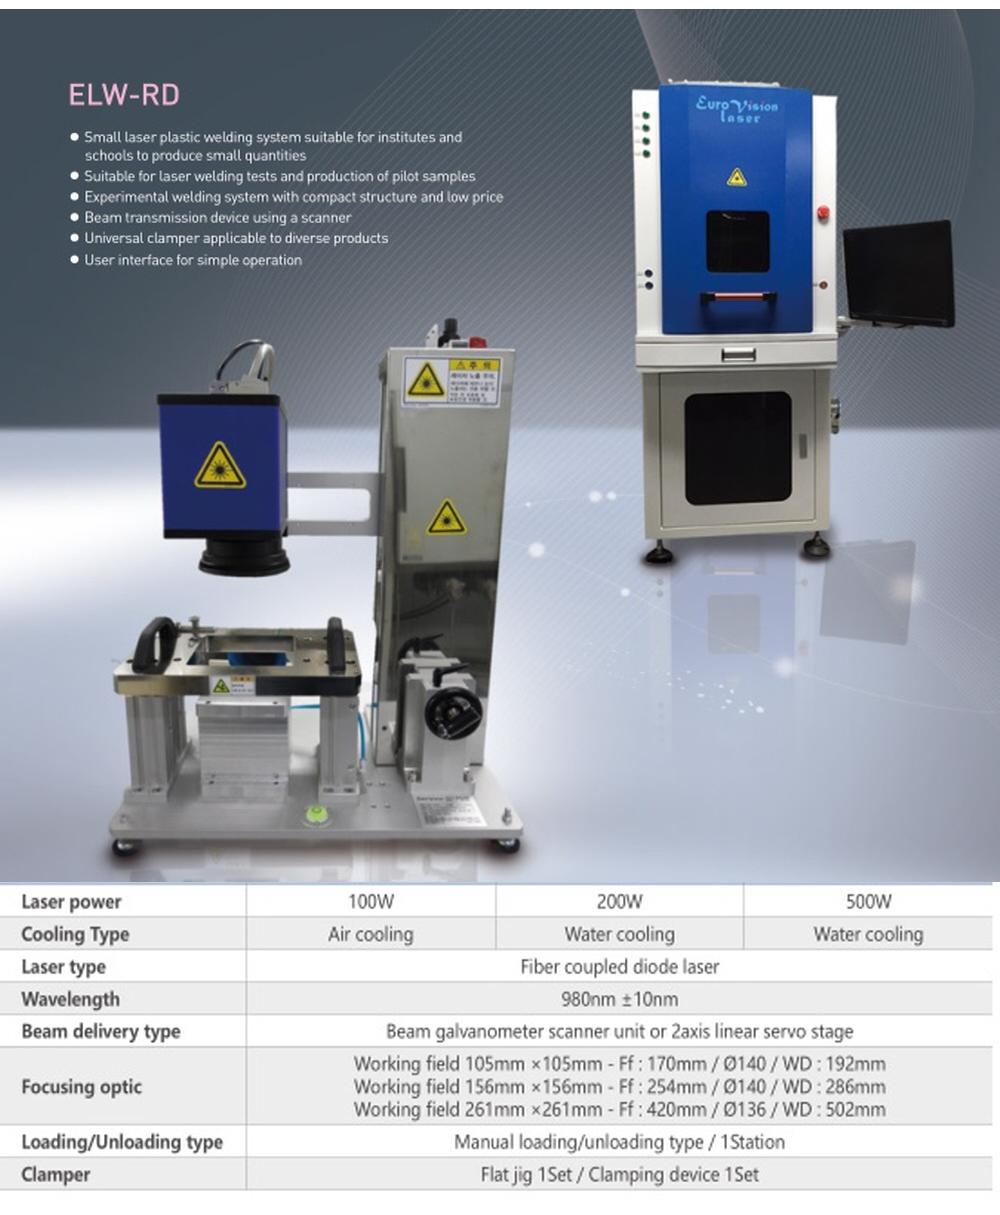 Euro Vision Laser Laser Plastic Welding M/C (R/D)